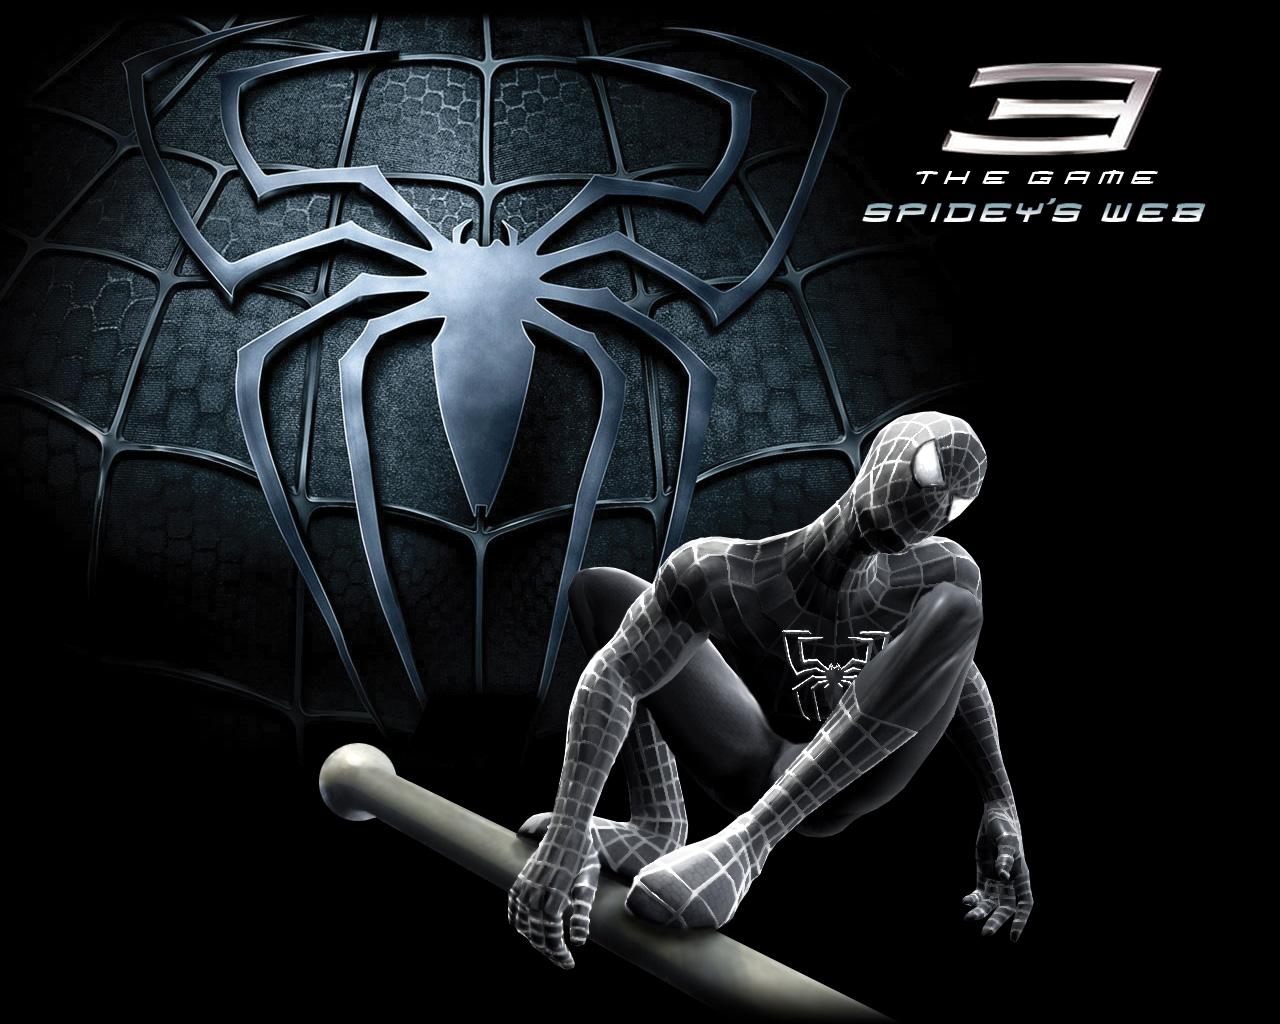 http://1.bp.blogspot.com/_kF3J2soAXgo/TUj3AaSEbSI/AAAAAAAABx0/kZgH2cSJsVQ/s1600/spiderman3-03.jpg